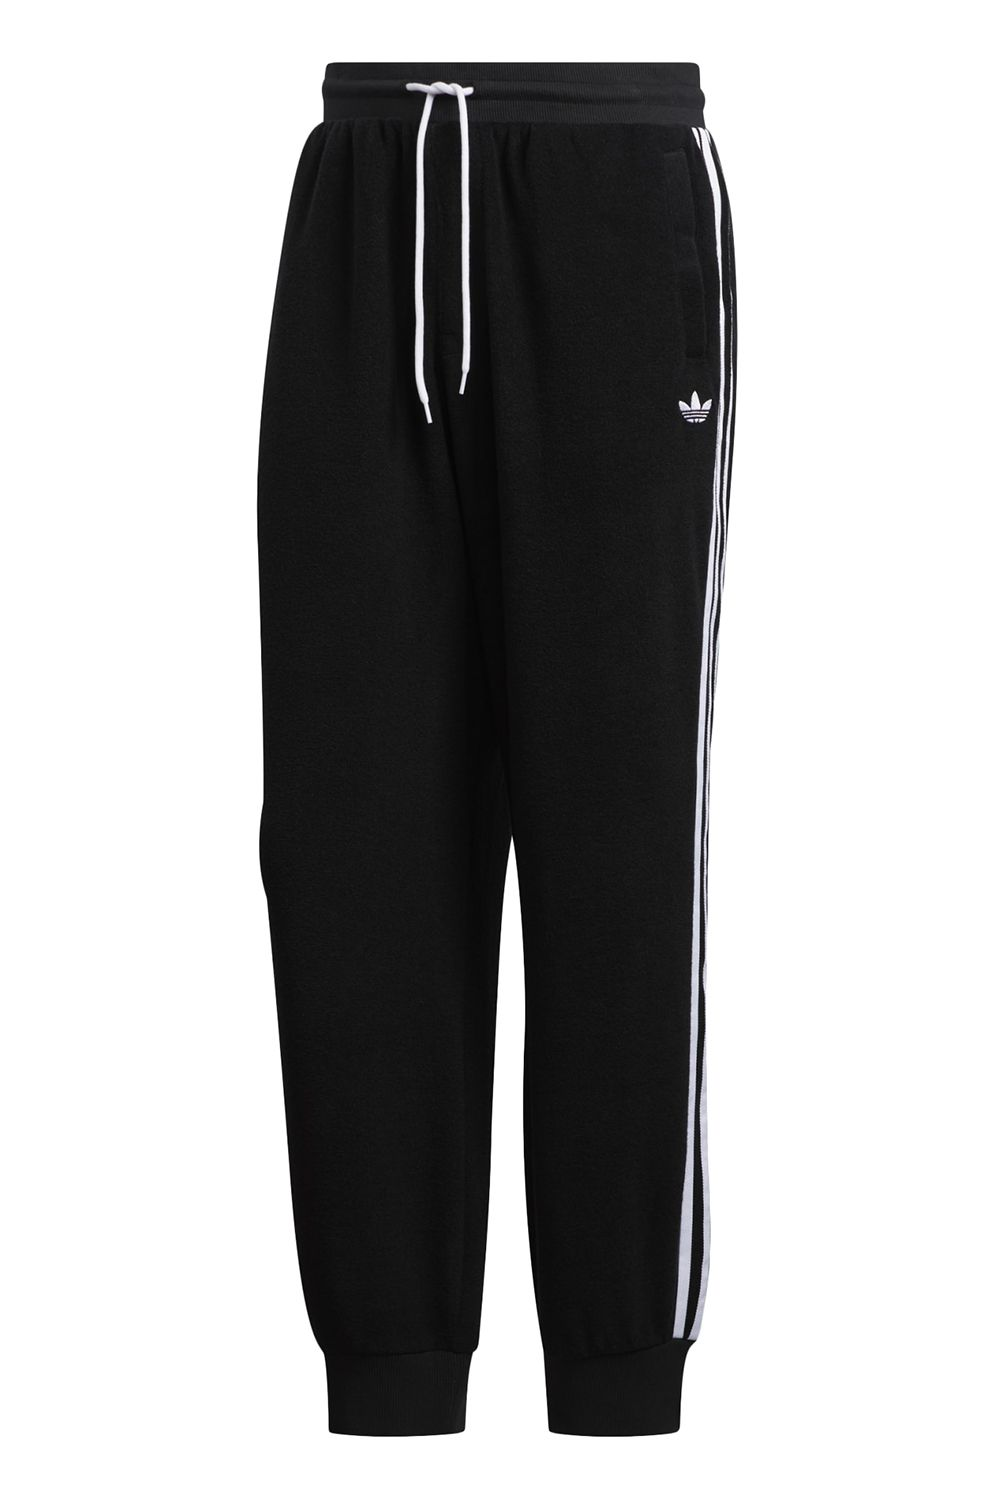 Adidas Pants BOUCLETTE Black/White